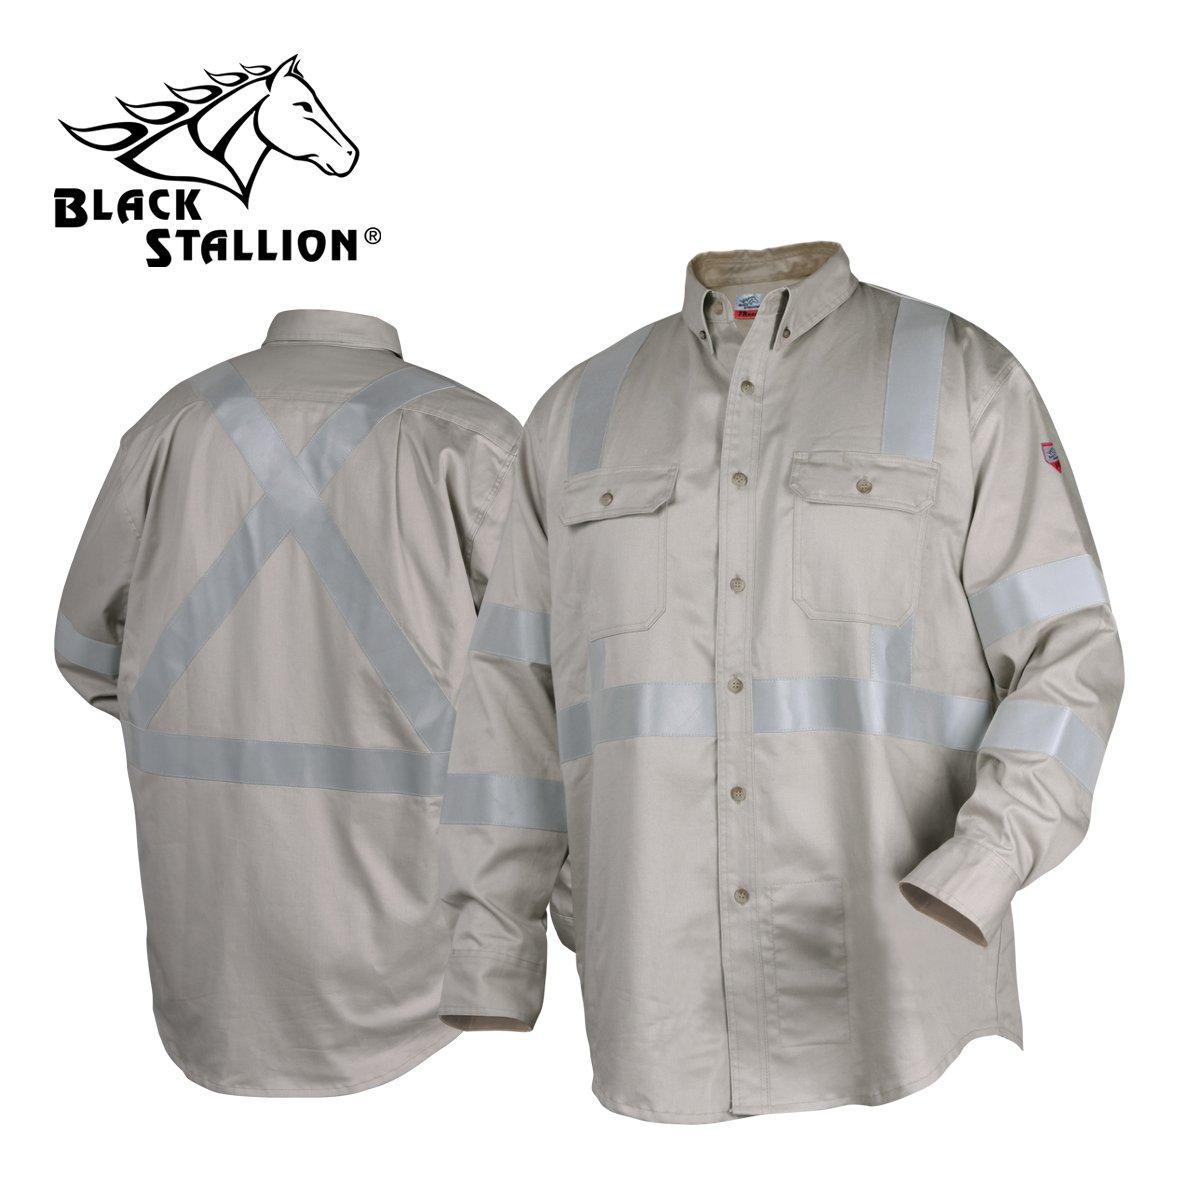 Black Stallion TruGuard 300 NFPA 2112 FR Work Shirt w/ Reflectives - 3X